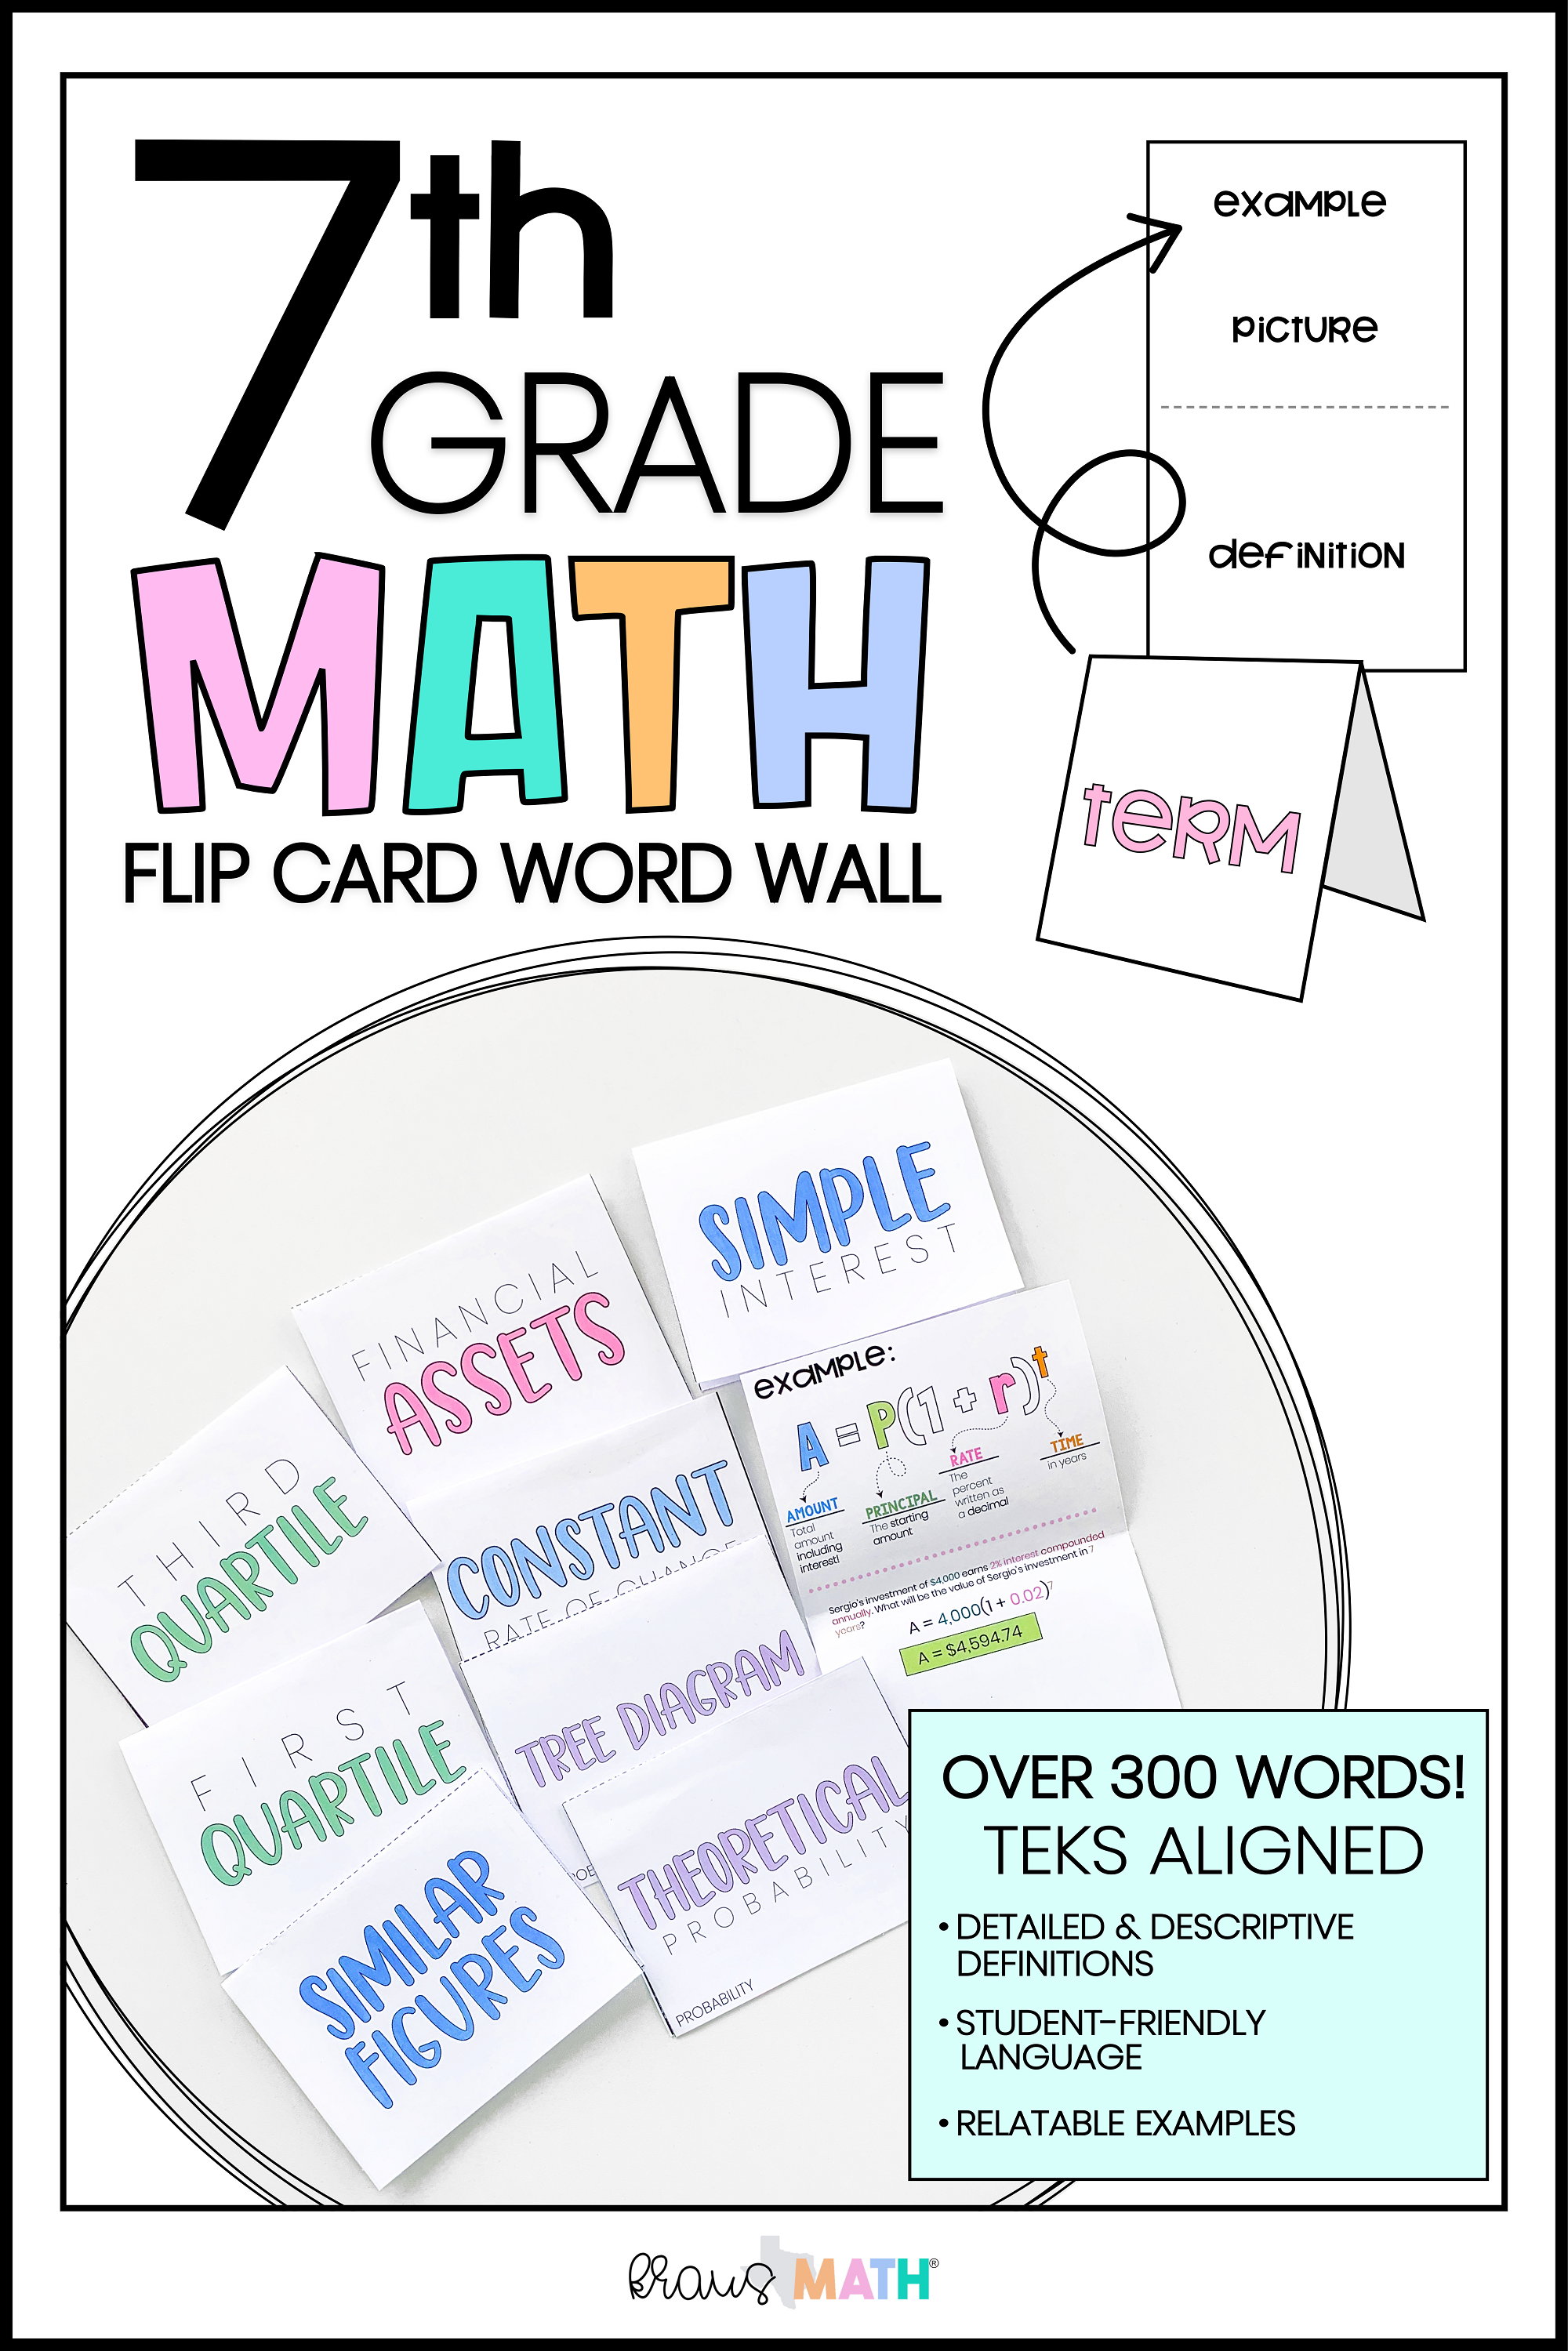 medium resolution of 7th Grade Math FLIP CARD Word Wall   Kraus Math   7th grade math